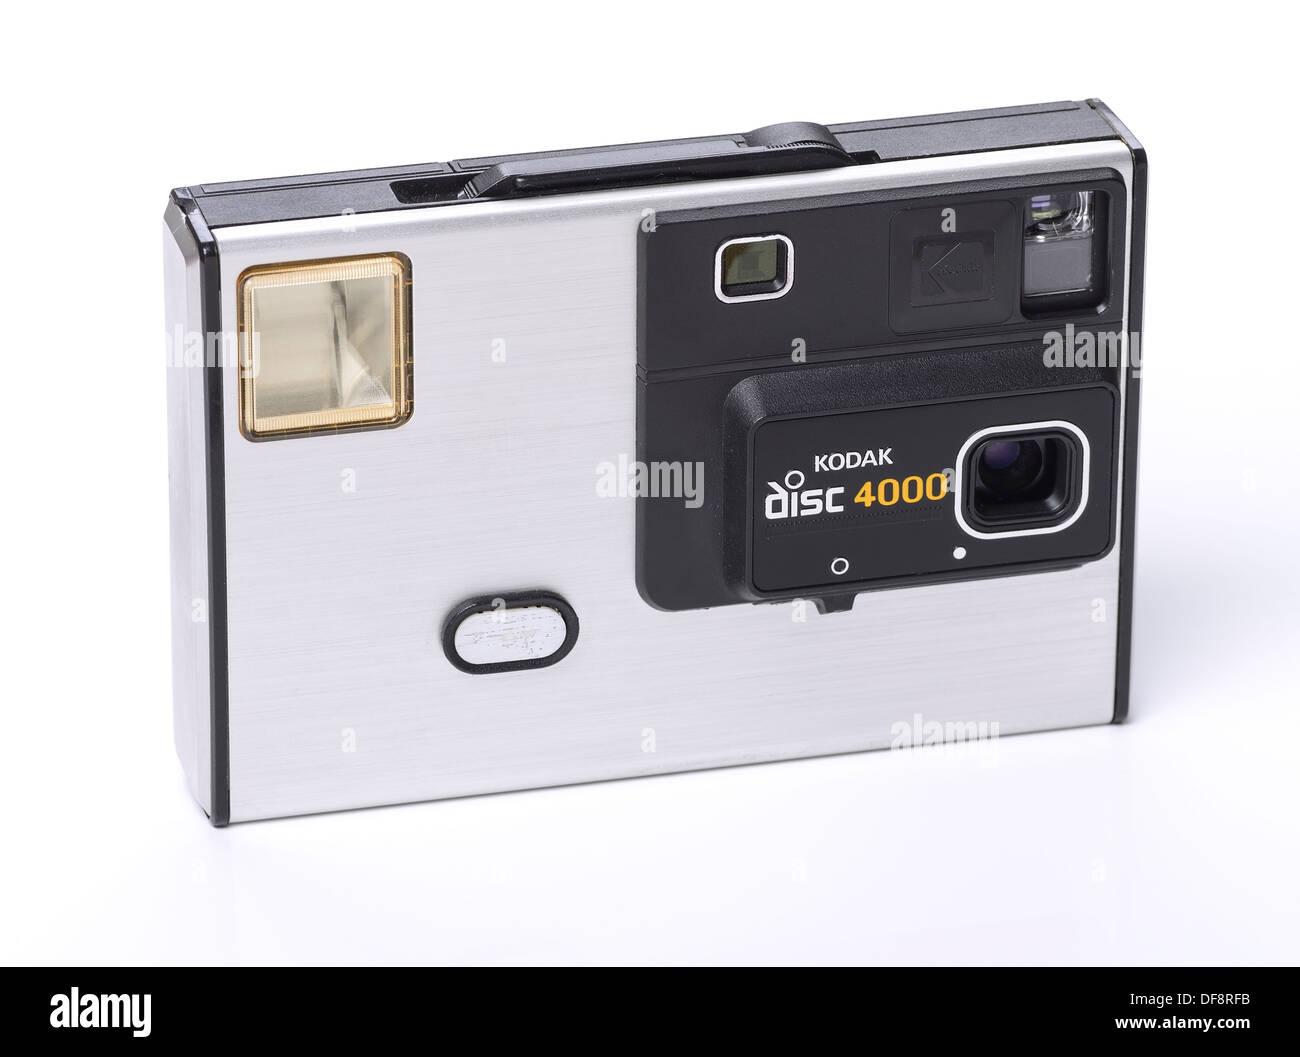 Ancienne rétro vintage appareil photo Kodak disc 4000 Photo Stock